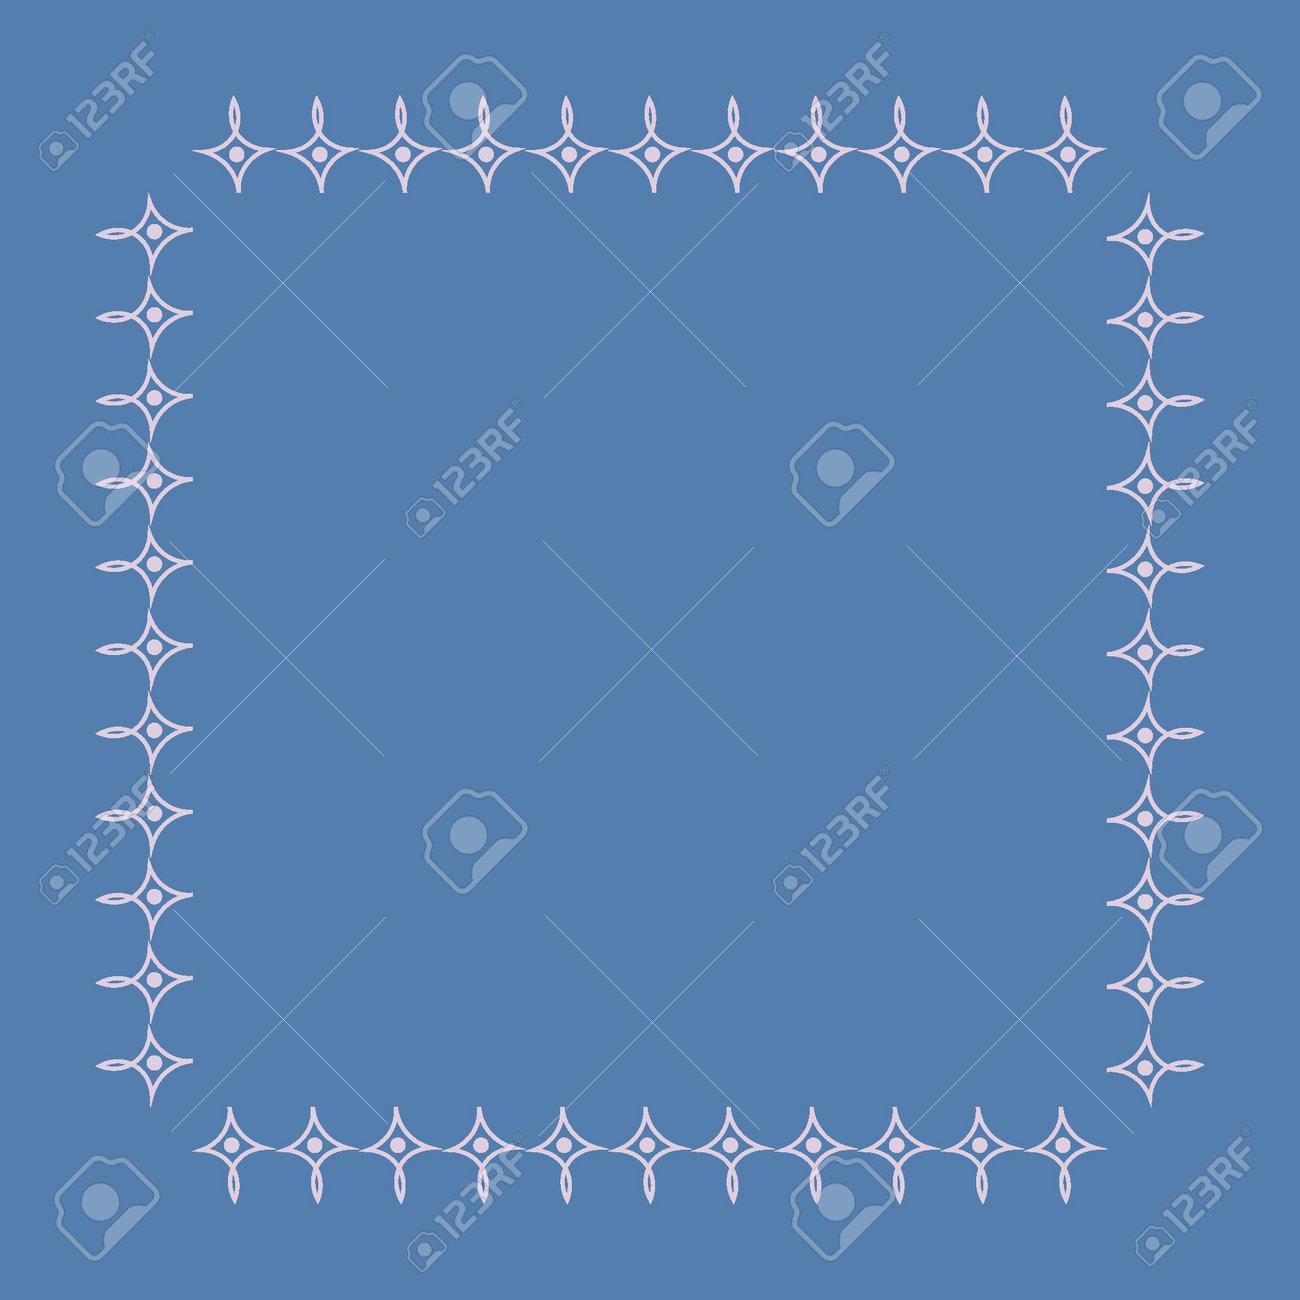 Stylized geometric pattern on a square background. Shape. Ethnic. Design element carpet simplicity. Art - 170610122